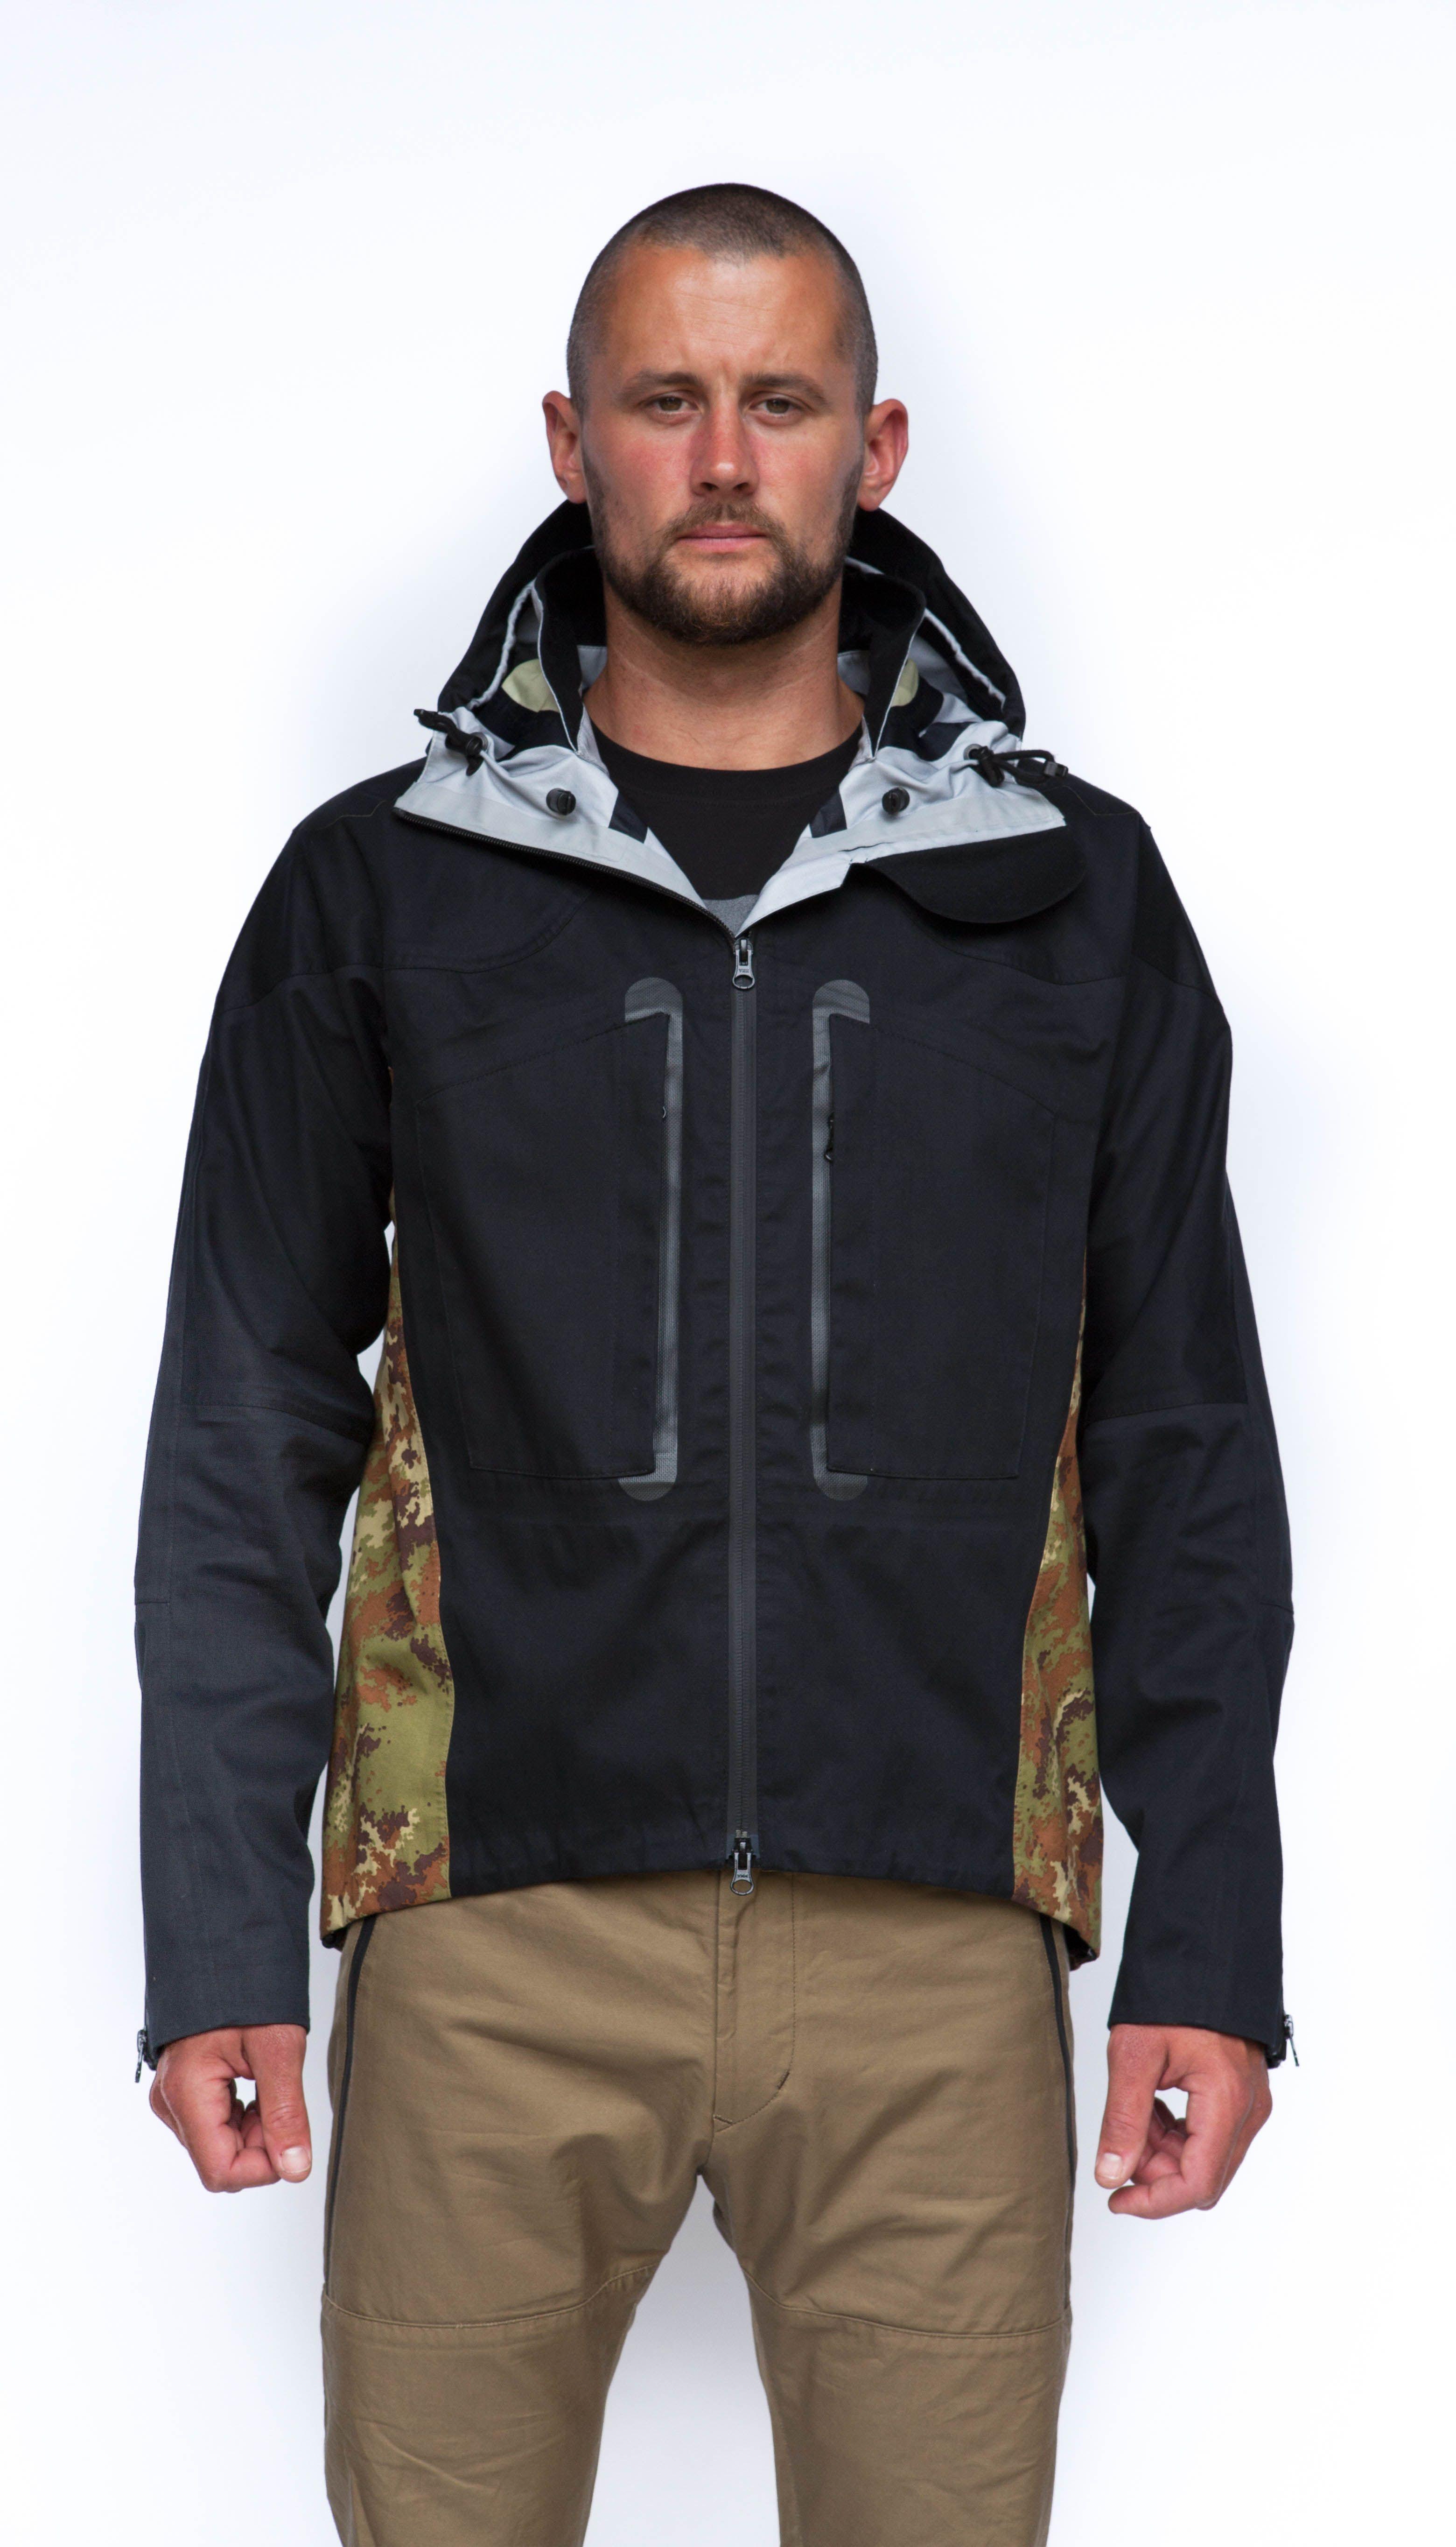 TECH CLIMBING JACKET BLACK Jackets, Nike inspiration